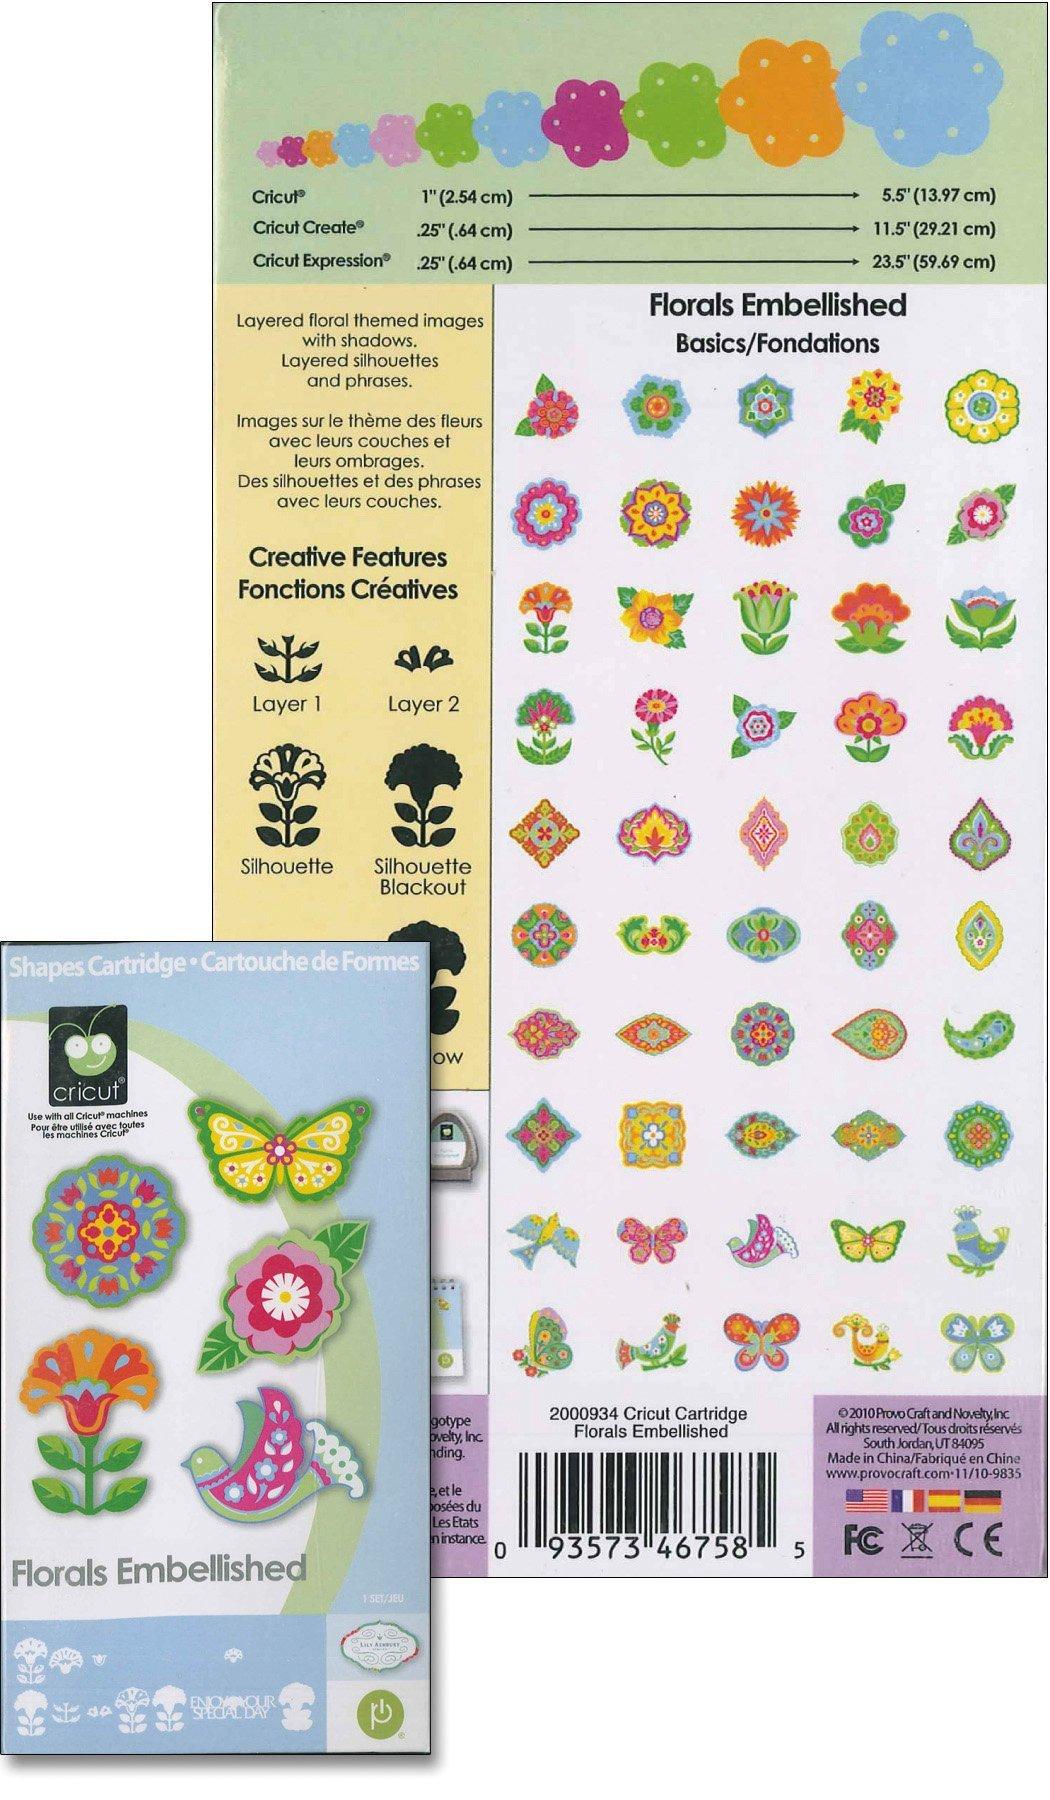 Cricut Florals Embellished Cartridge